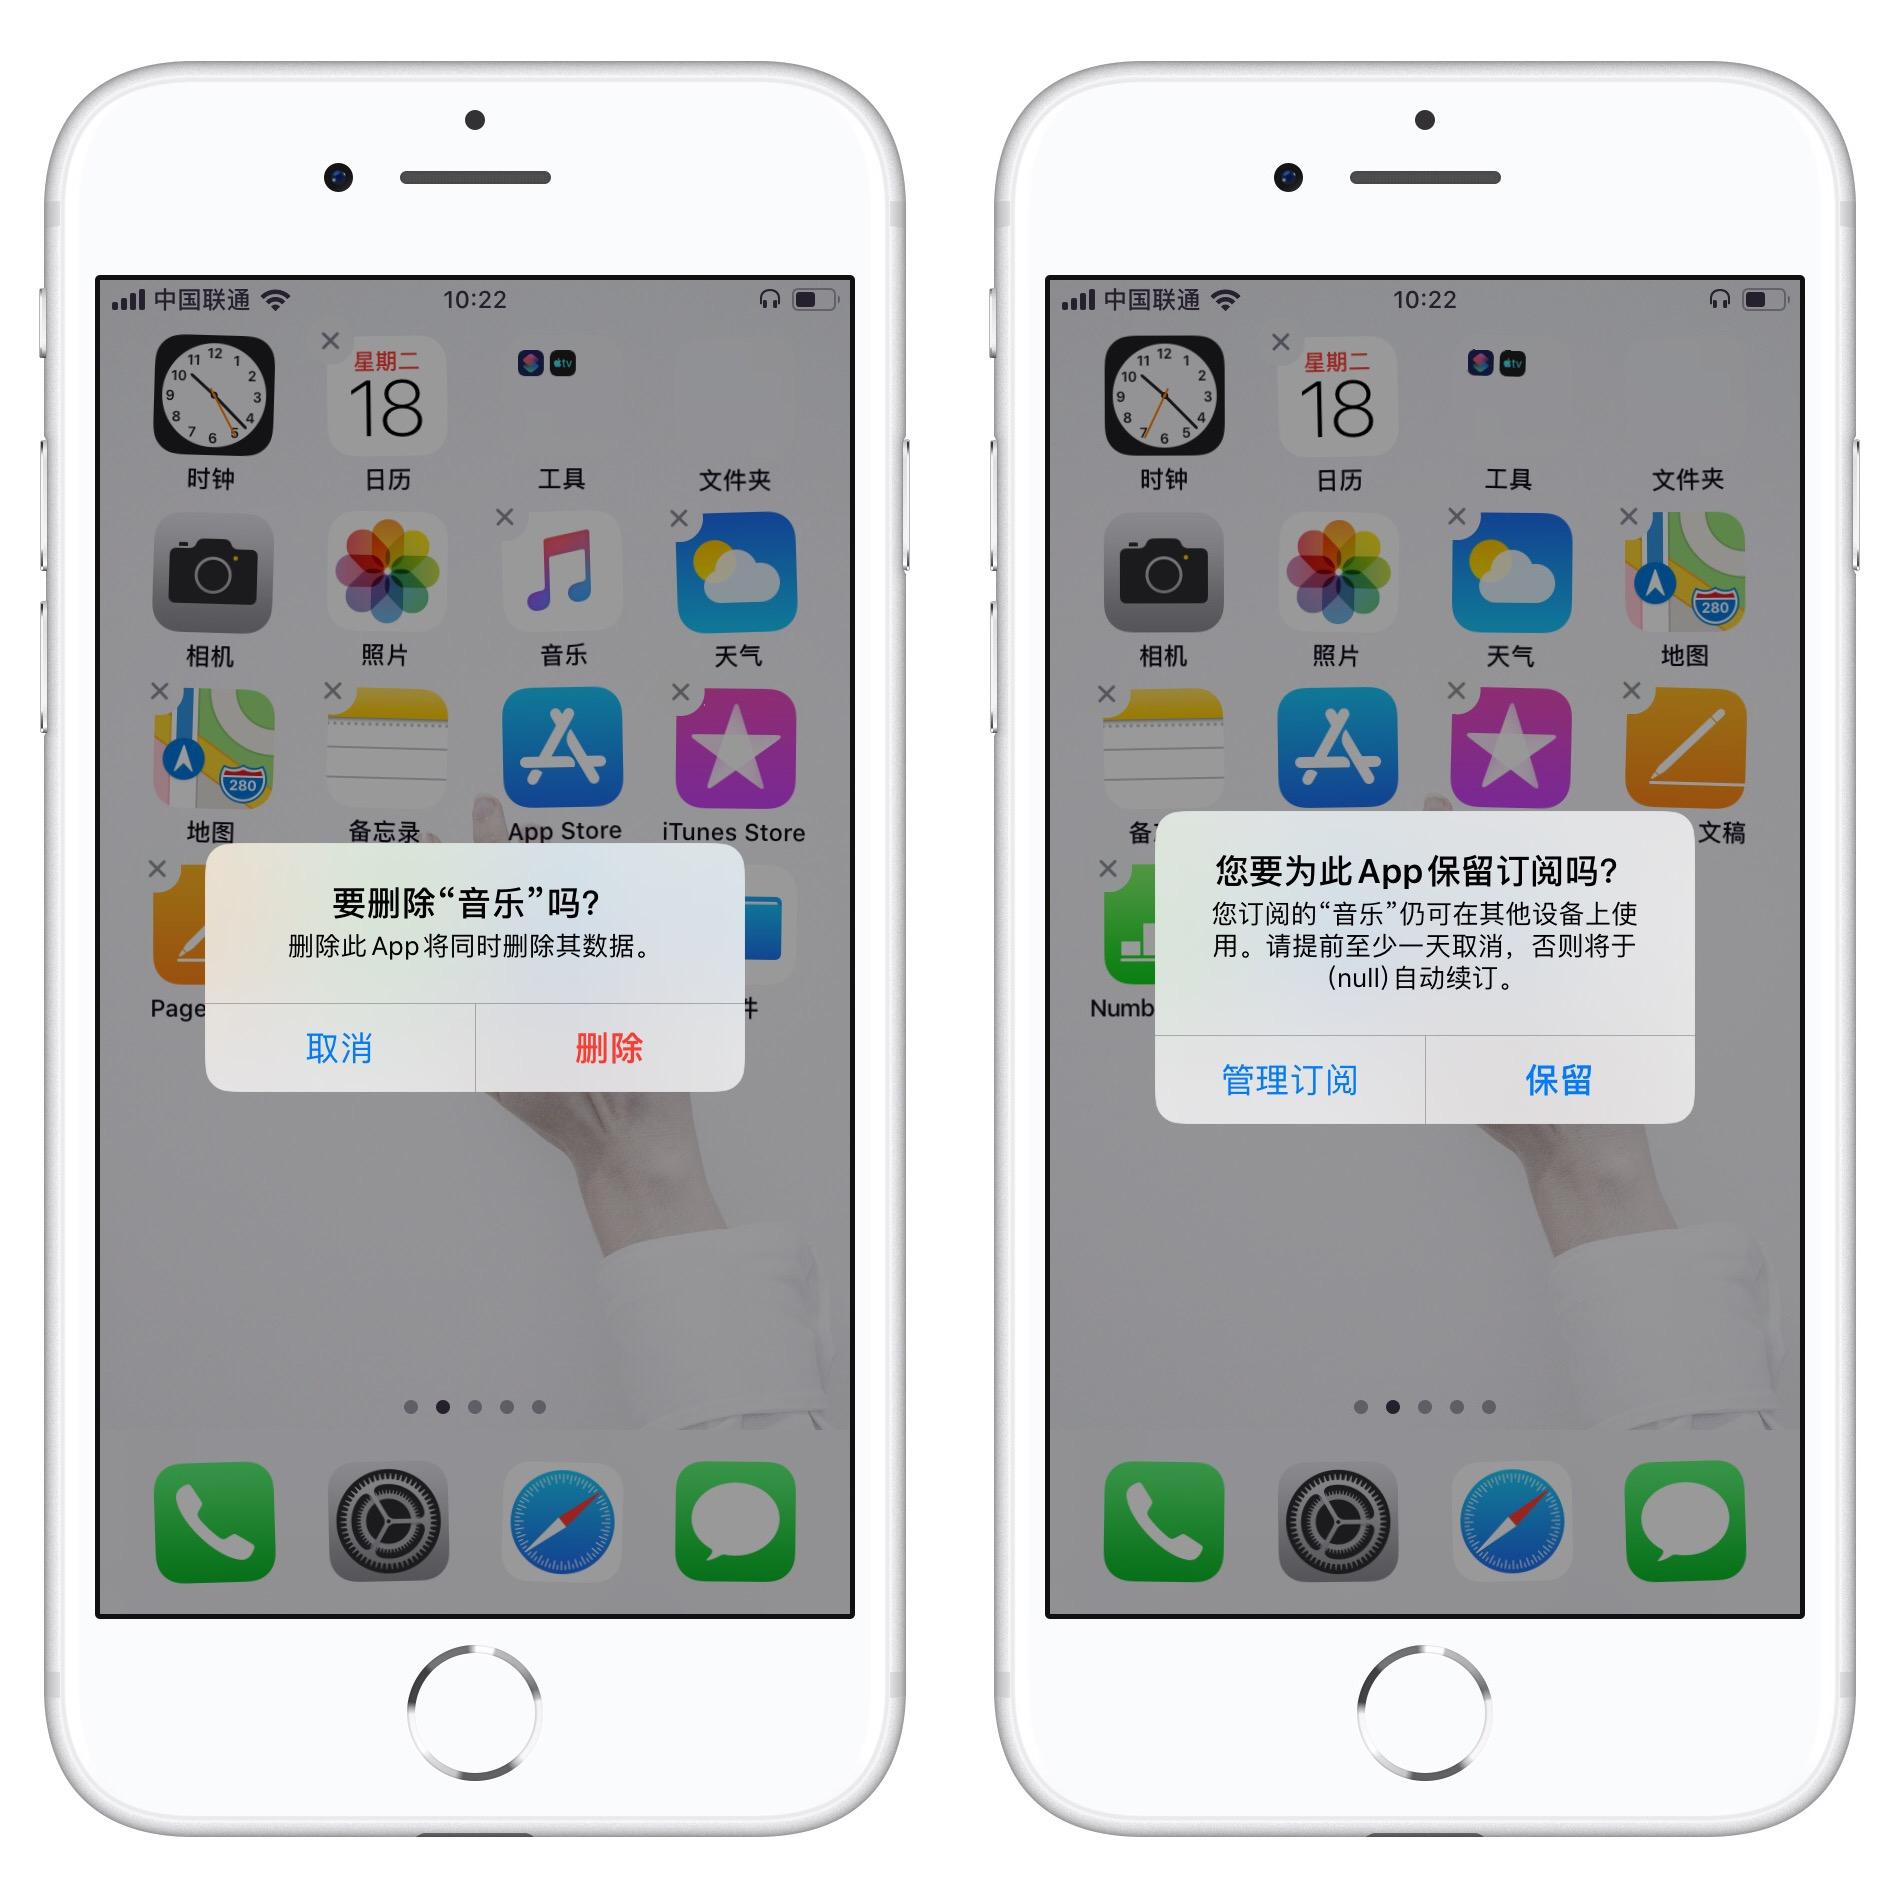 iOS 13 beta 2 两项小功能更新:删除订阅提示是否保留订阅